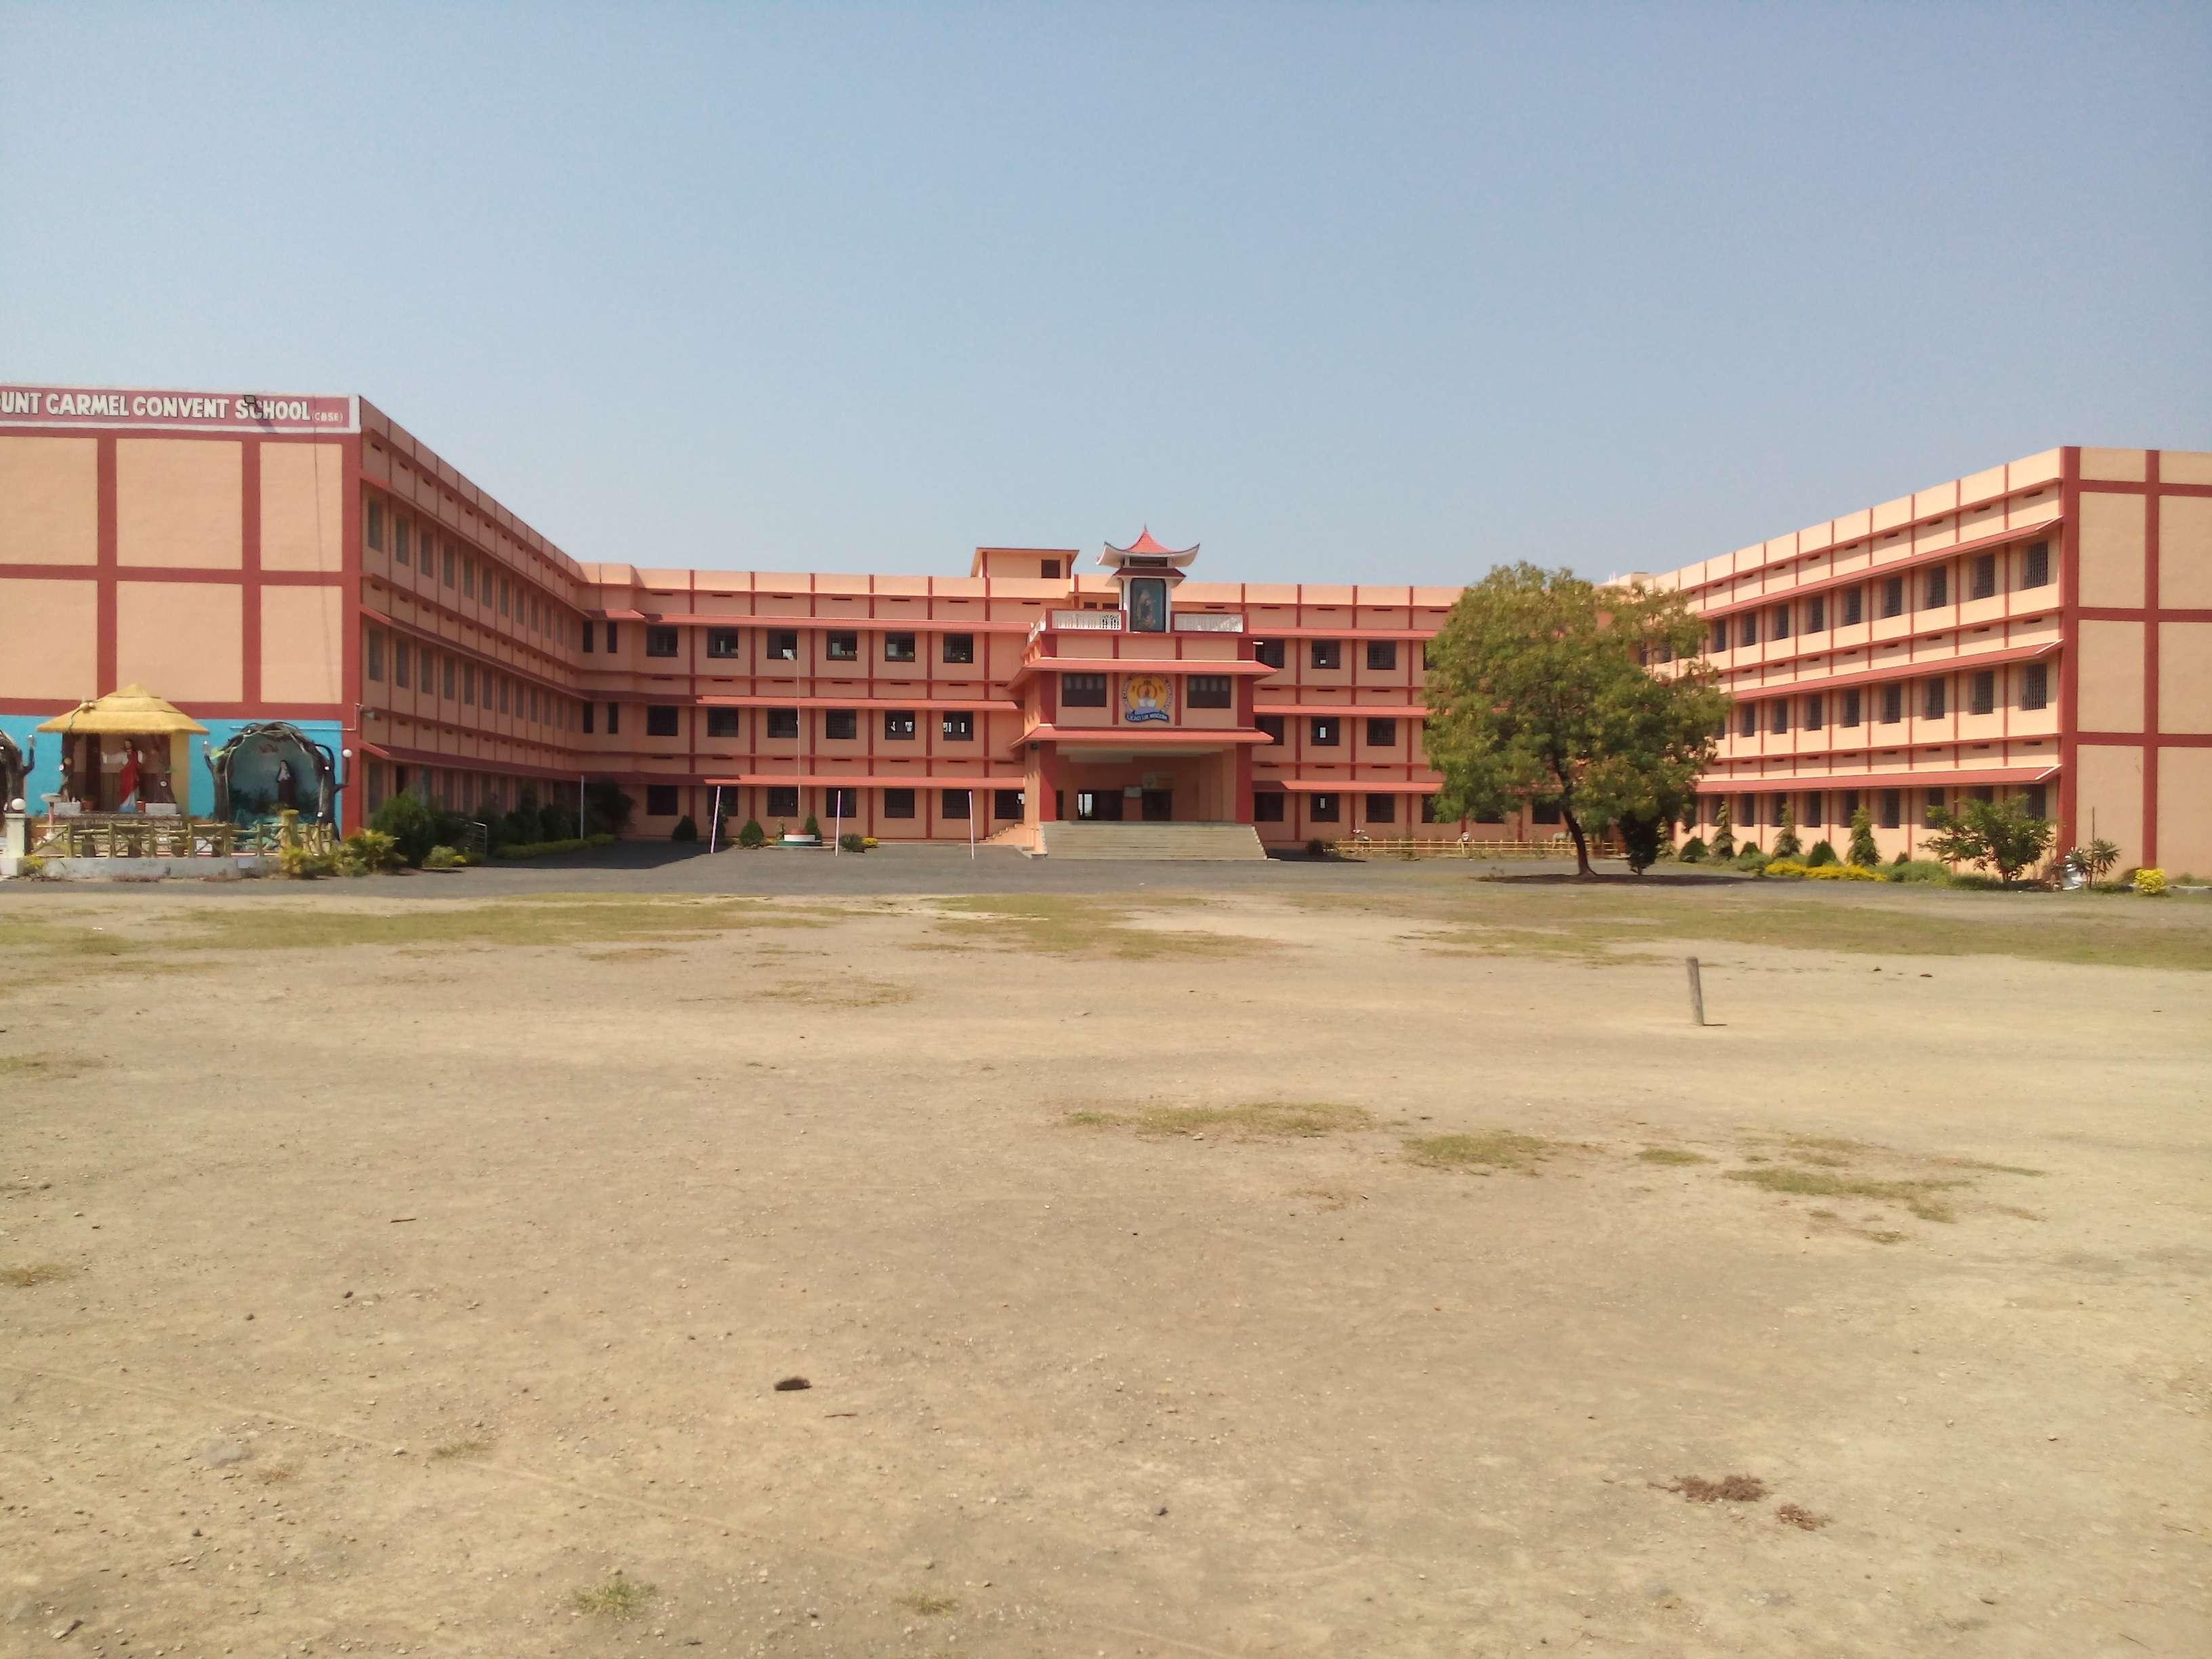 mount carmel convent school master colony,p o  samudrapur - The